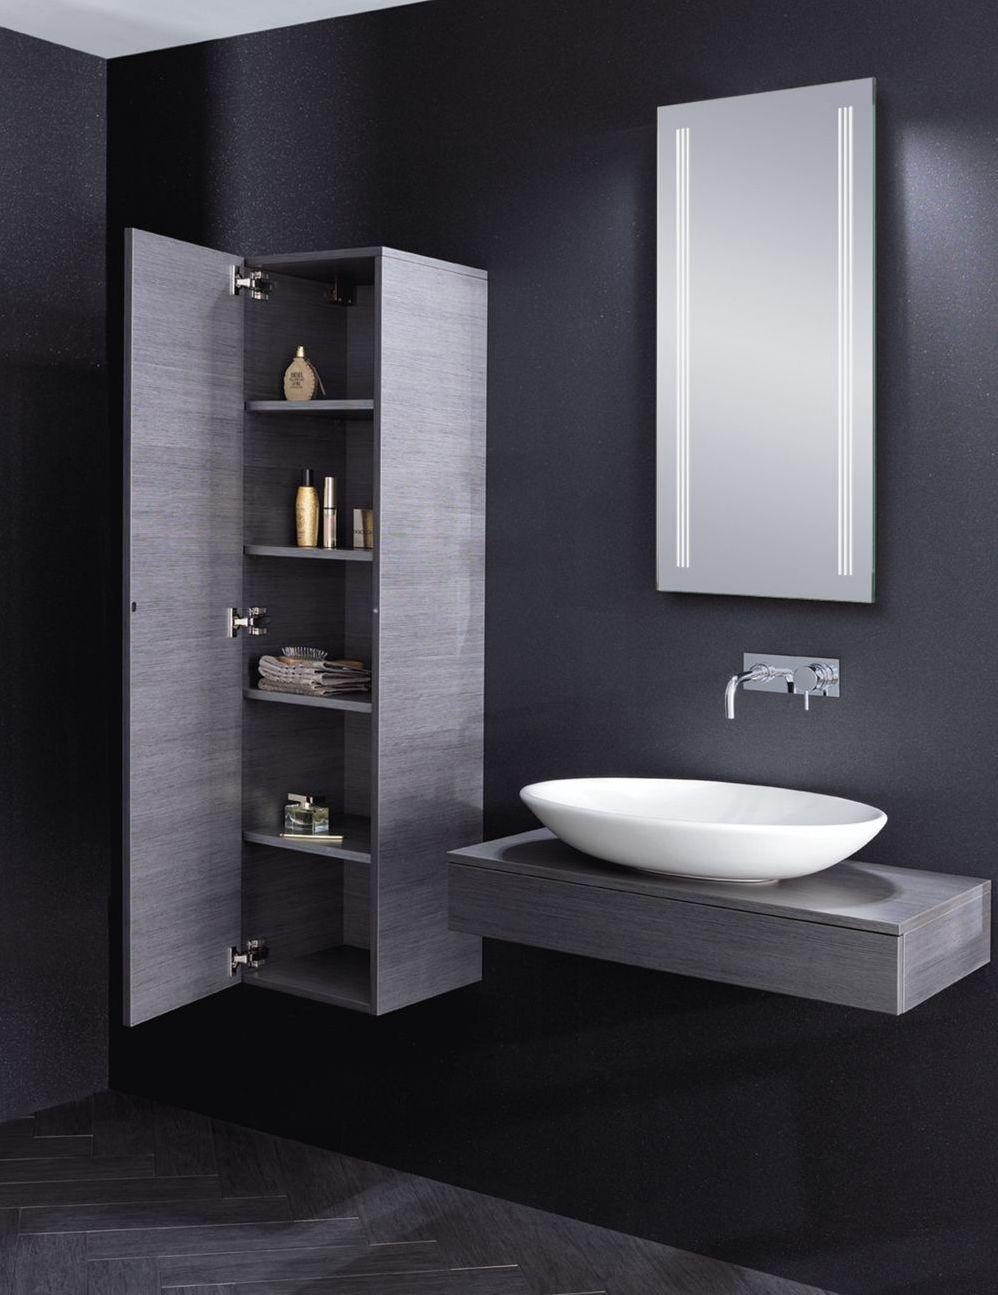 15 Amazing Guest Board Bathroom Inspiration From Crosswater Bathroom Interior Decorating Stylish Bathroom Modern Bathroom Design [ 1295 x 998 Pixel ]